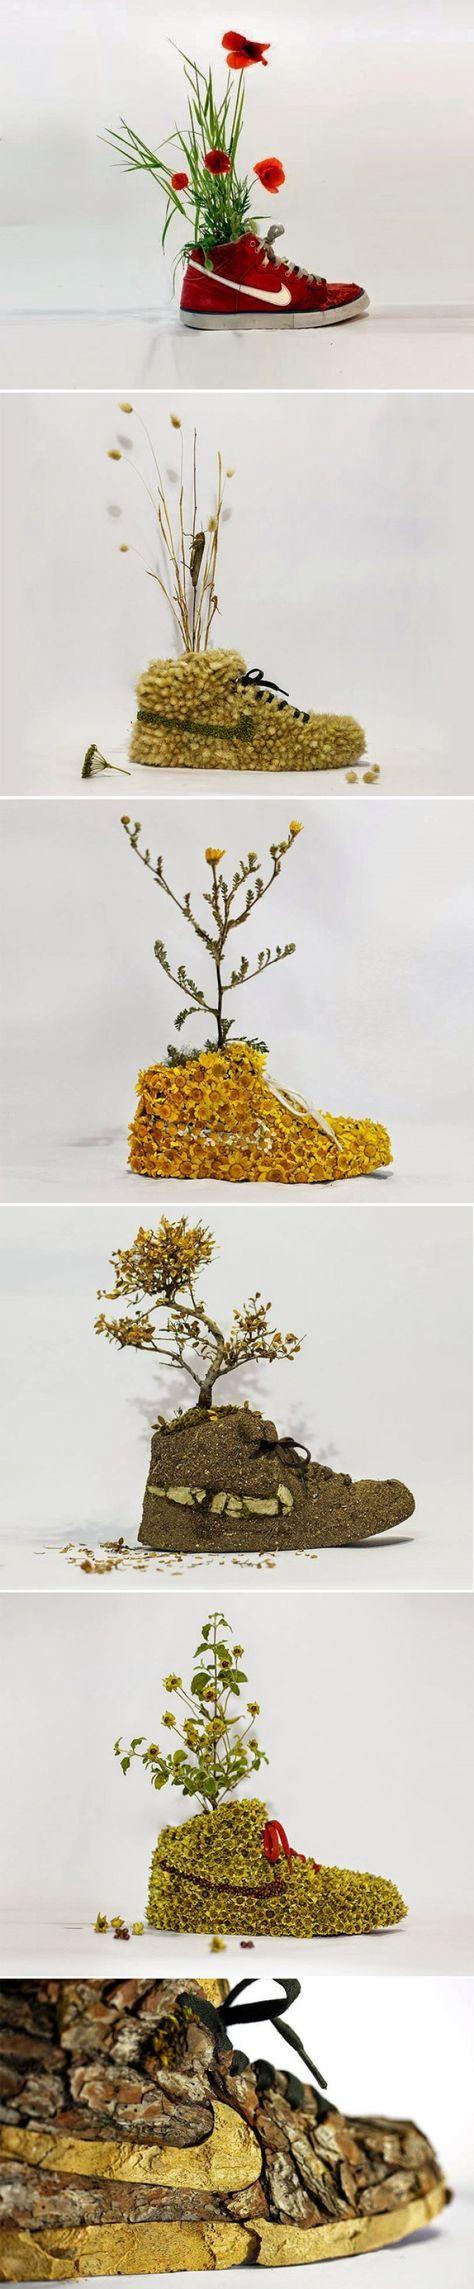 Christophe Guinet or Mr. Plant - Old Nike shoes sculptures